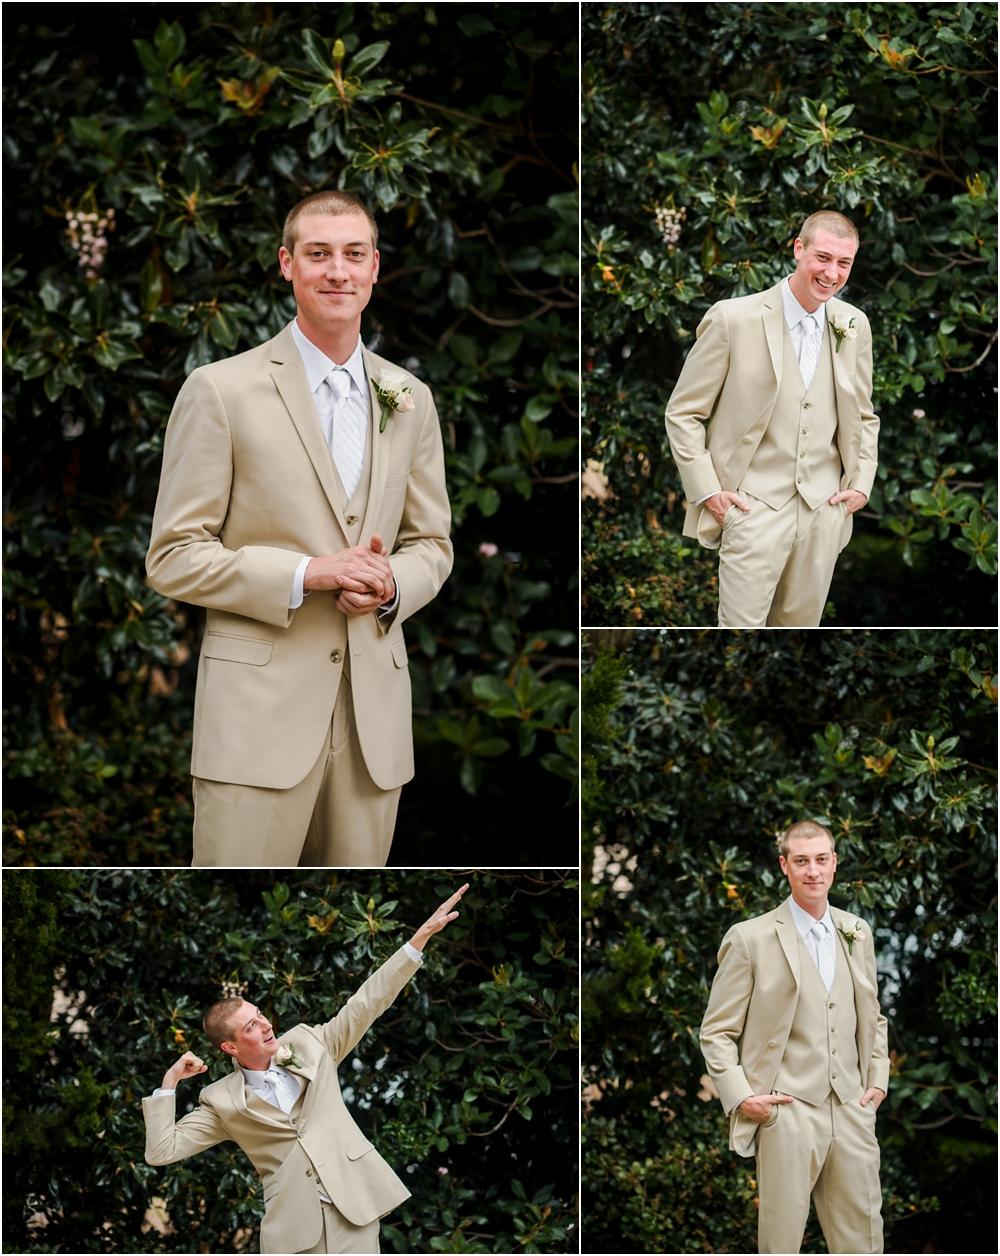 pensacola-wedding-photographer-kiersten-grant-65.jpg